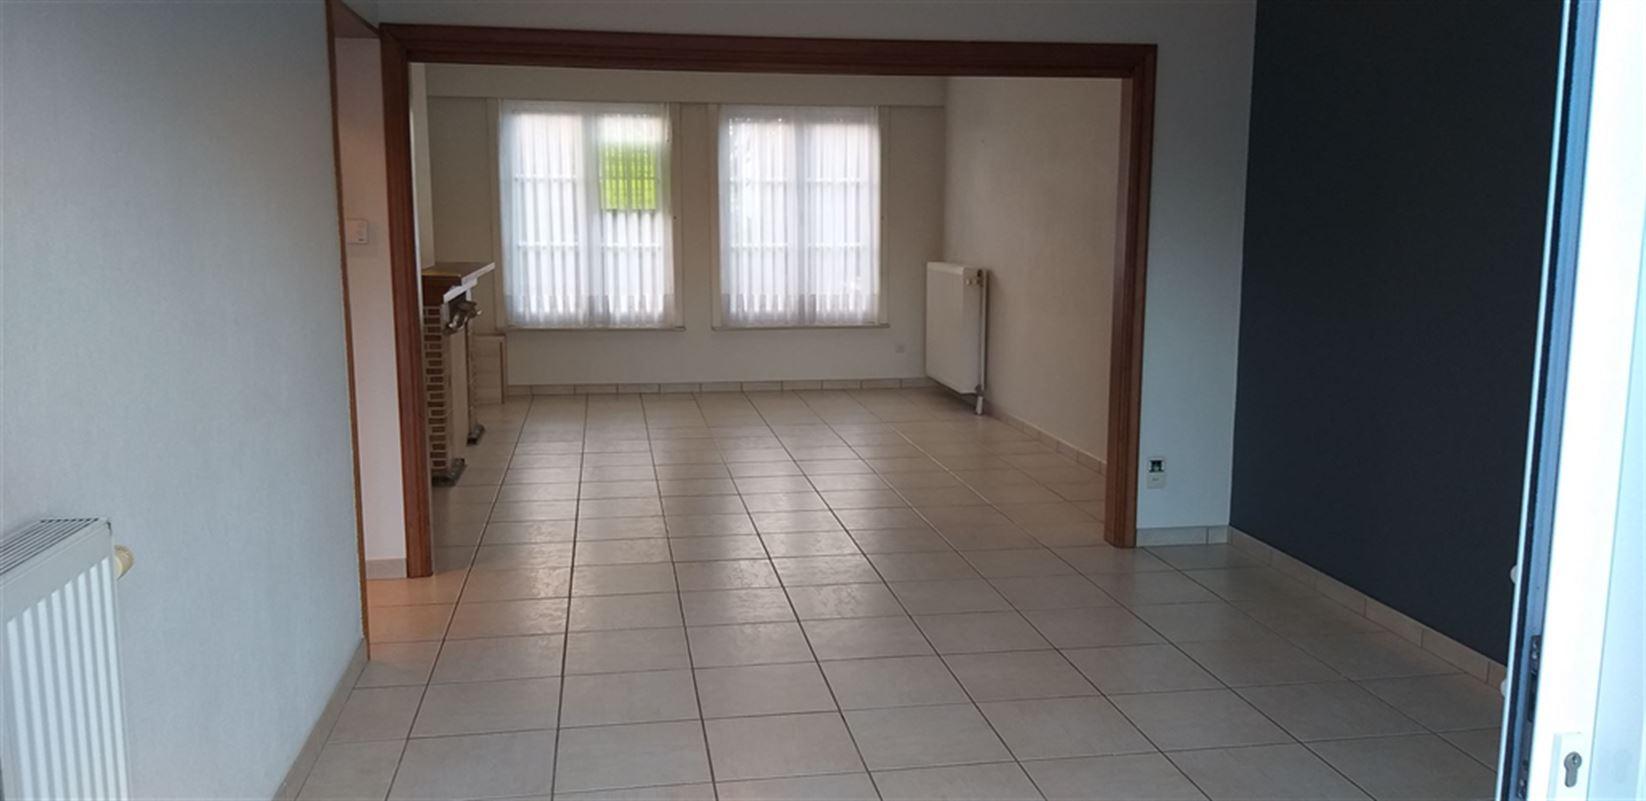 Foto 4 : Huis te 8500 KORTRIJK (België) - Prijs € 795